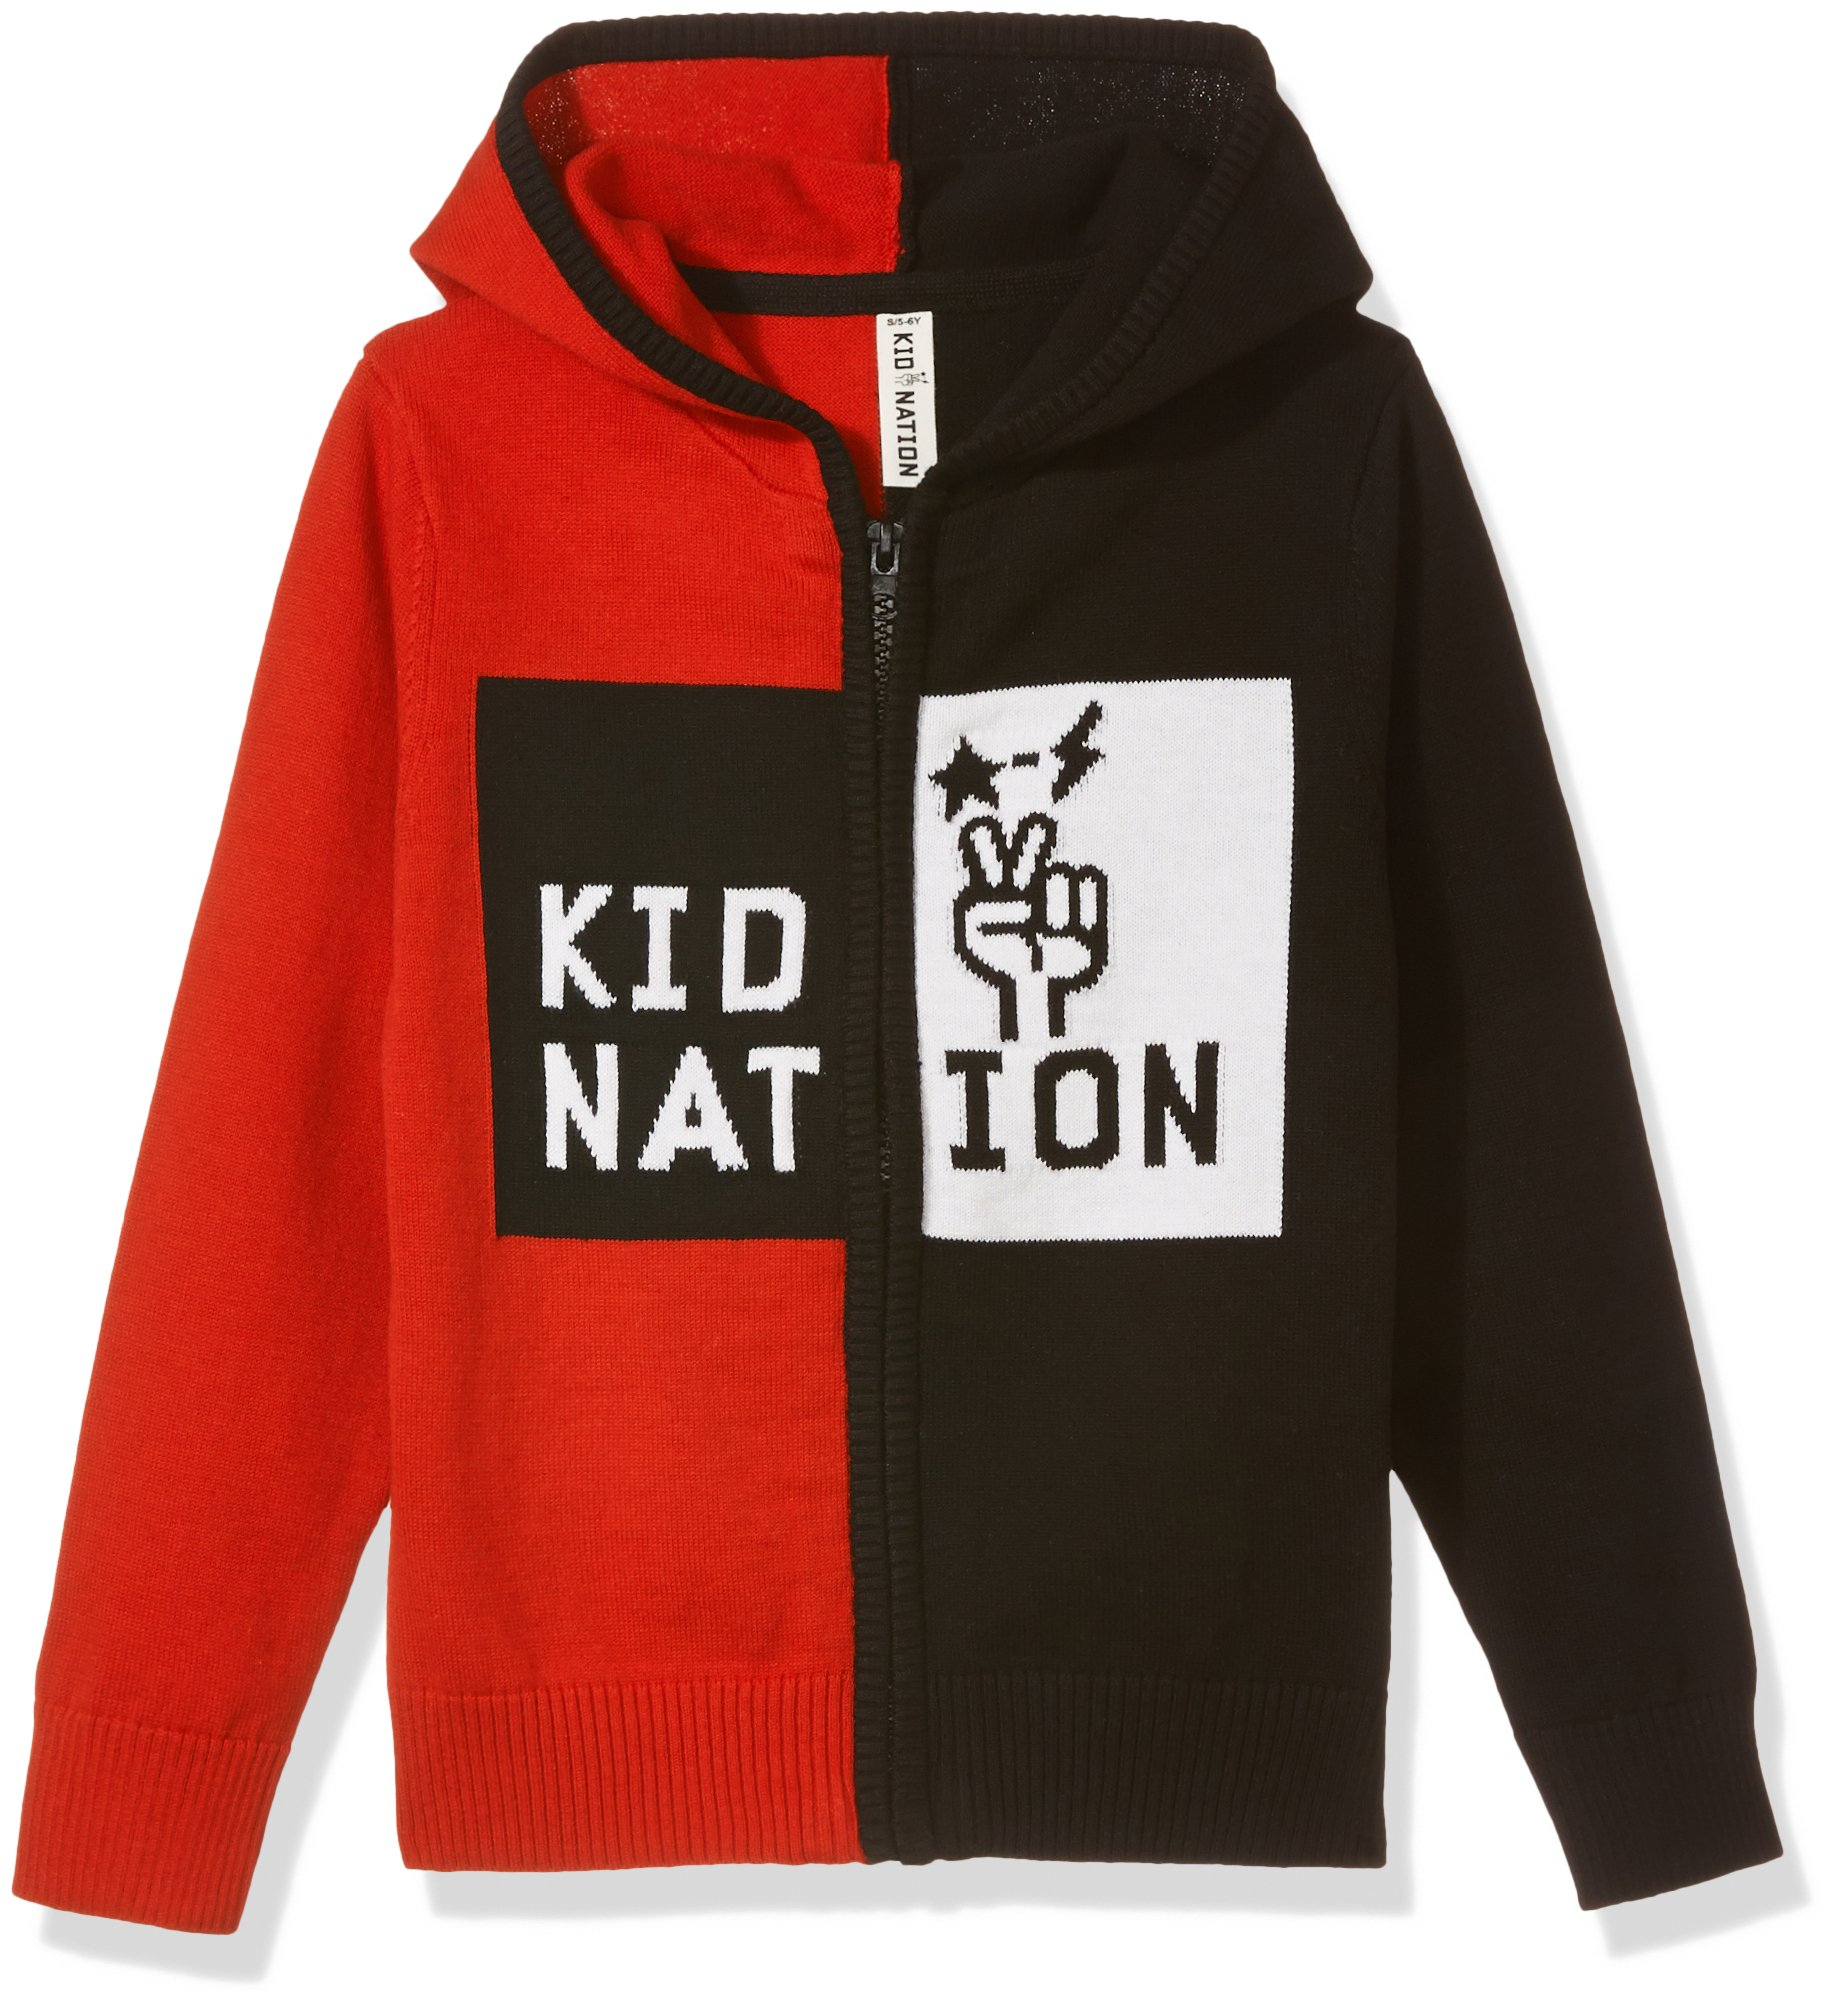 Kid Nation Kids' Long Sleeve Color Block Zip Hoodie Sweater XL Red for Boys or Girls